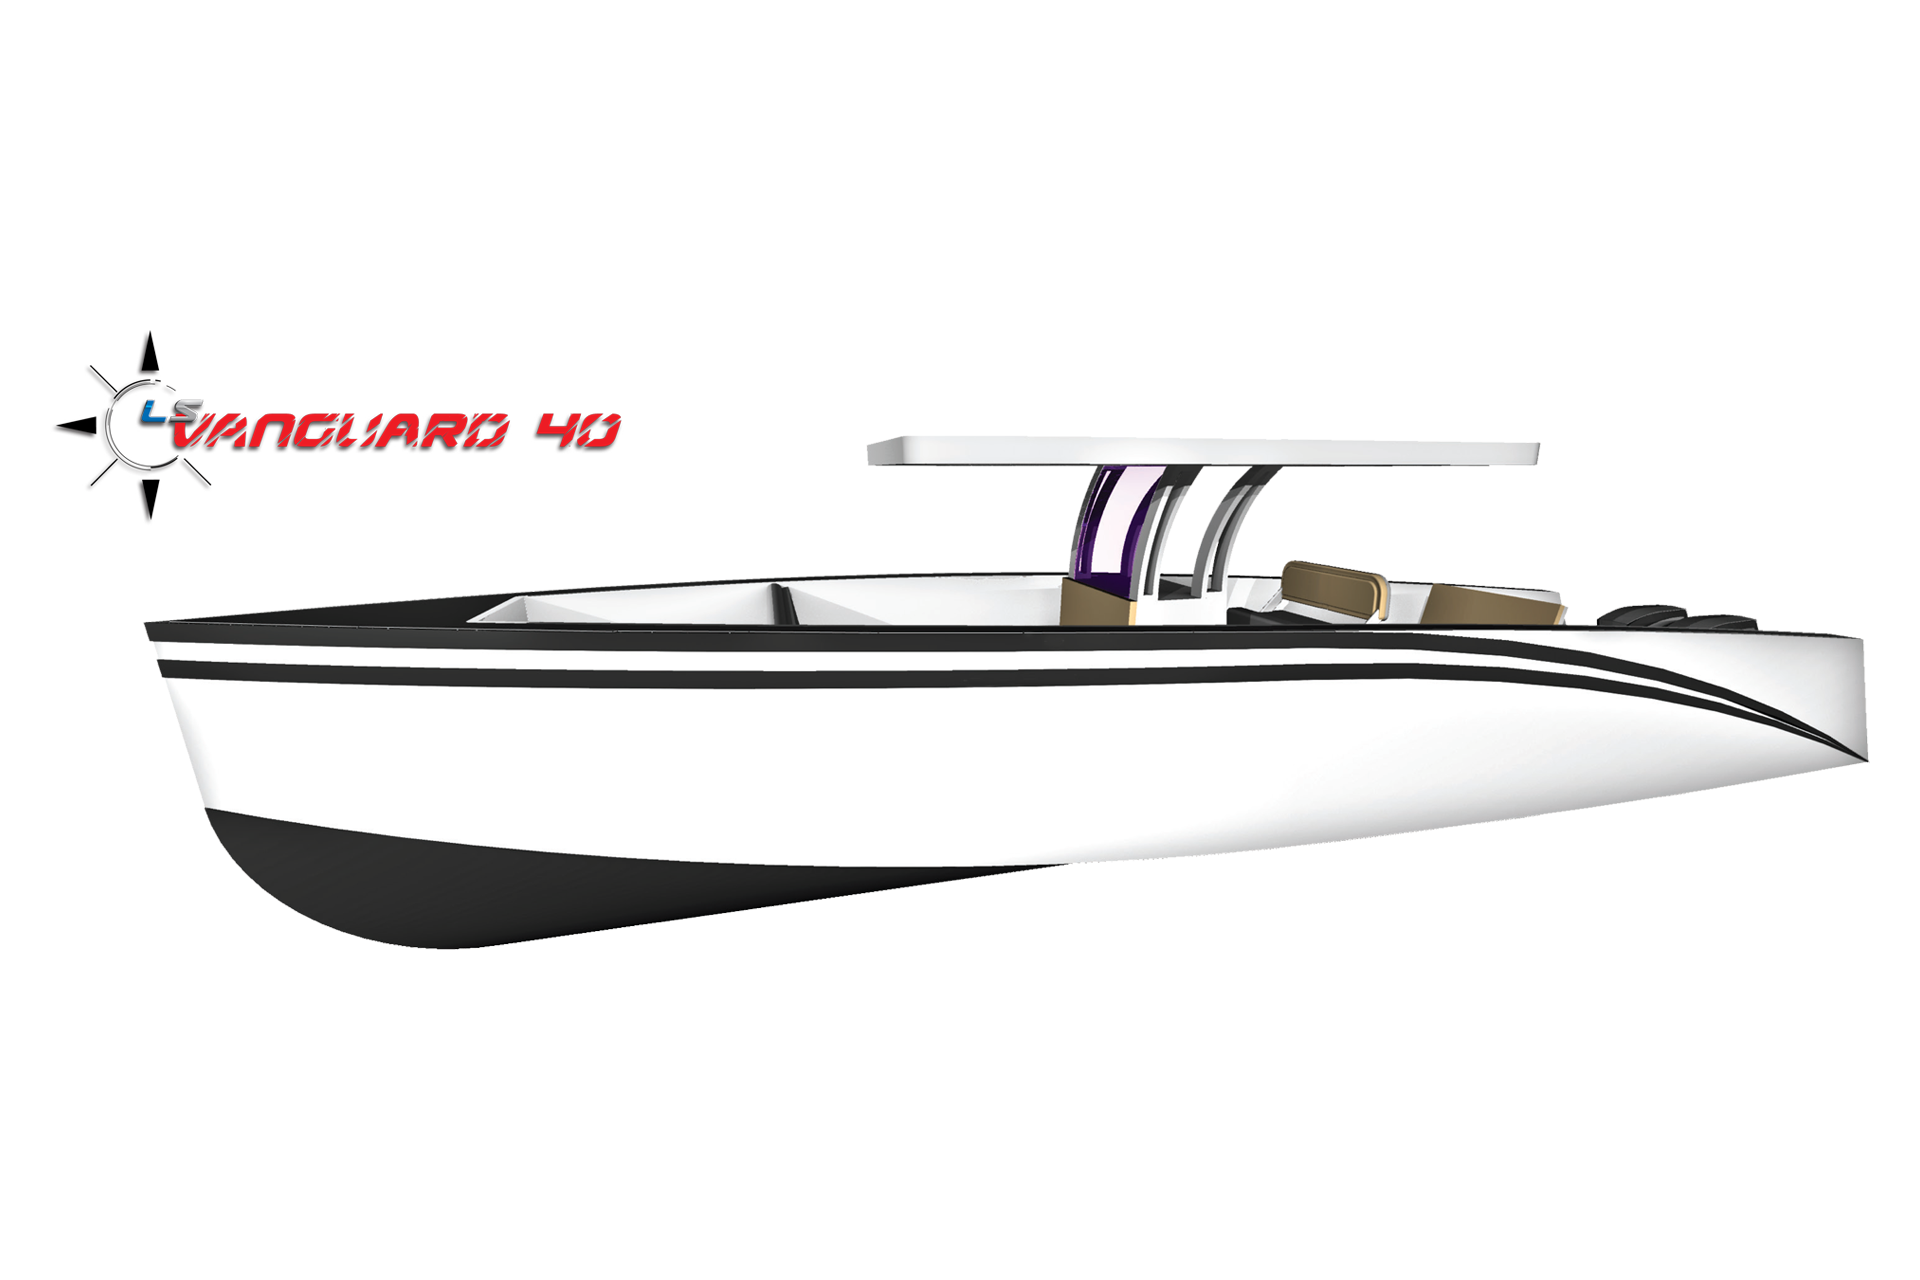 LS Vanguard